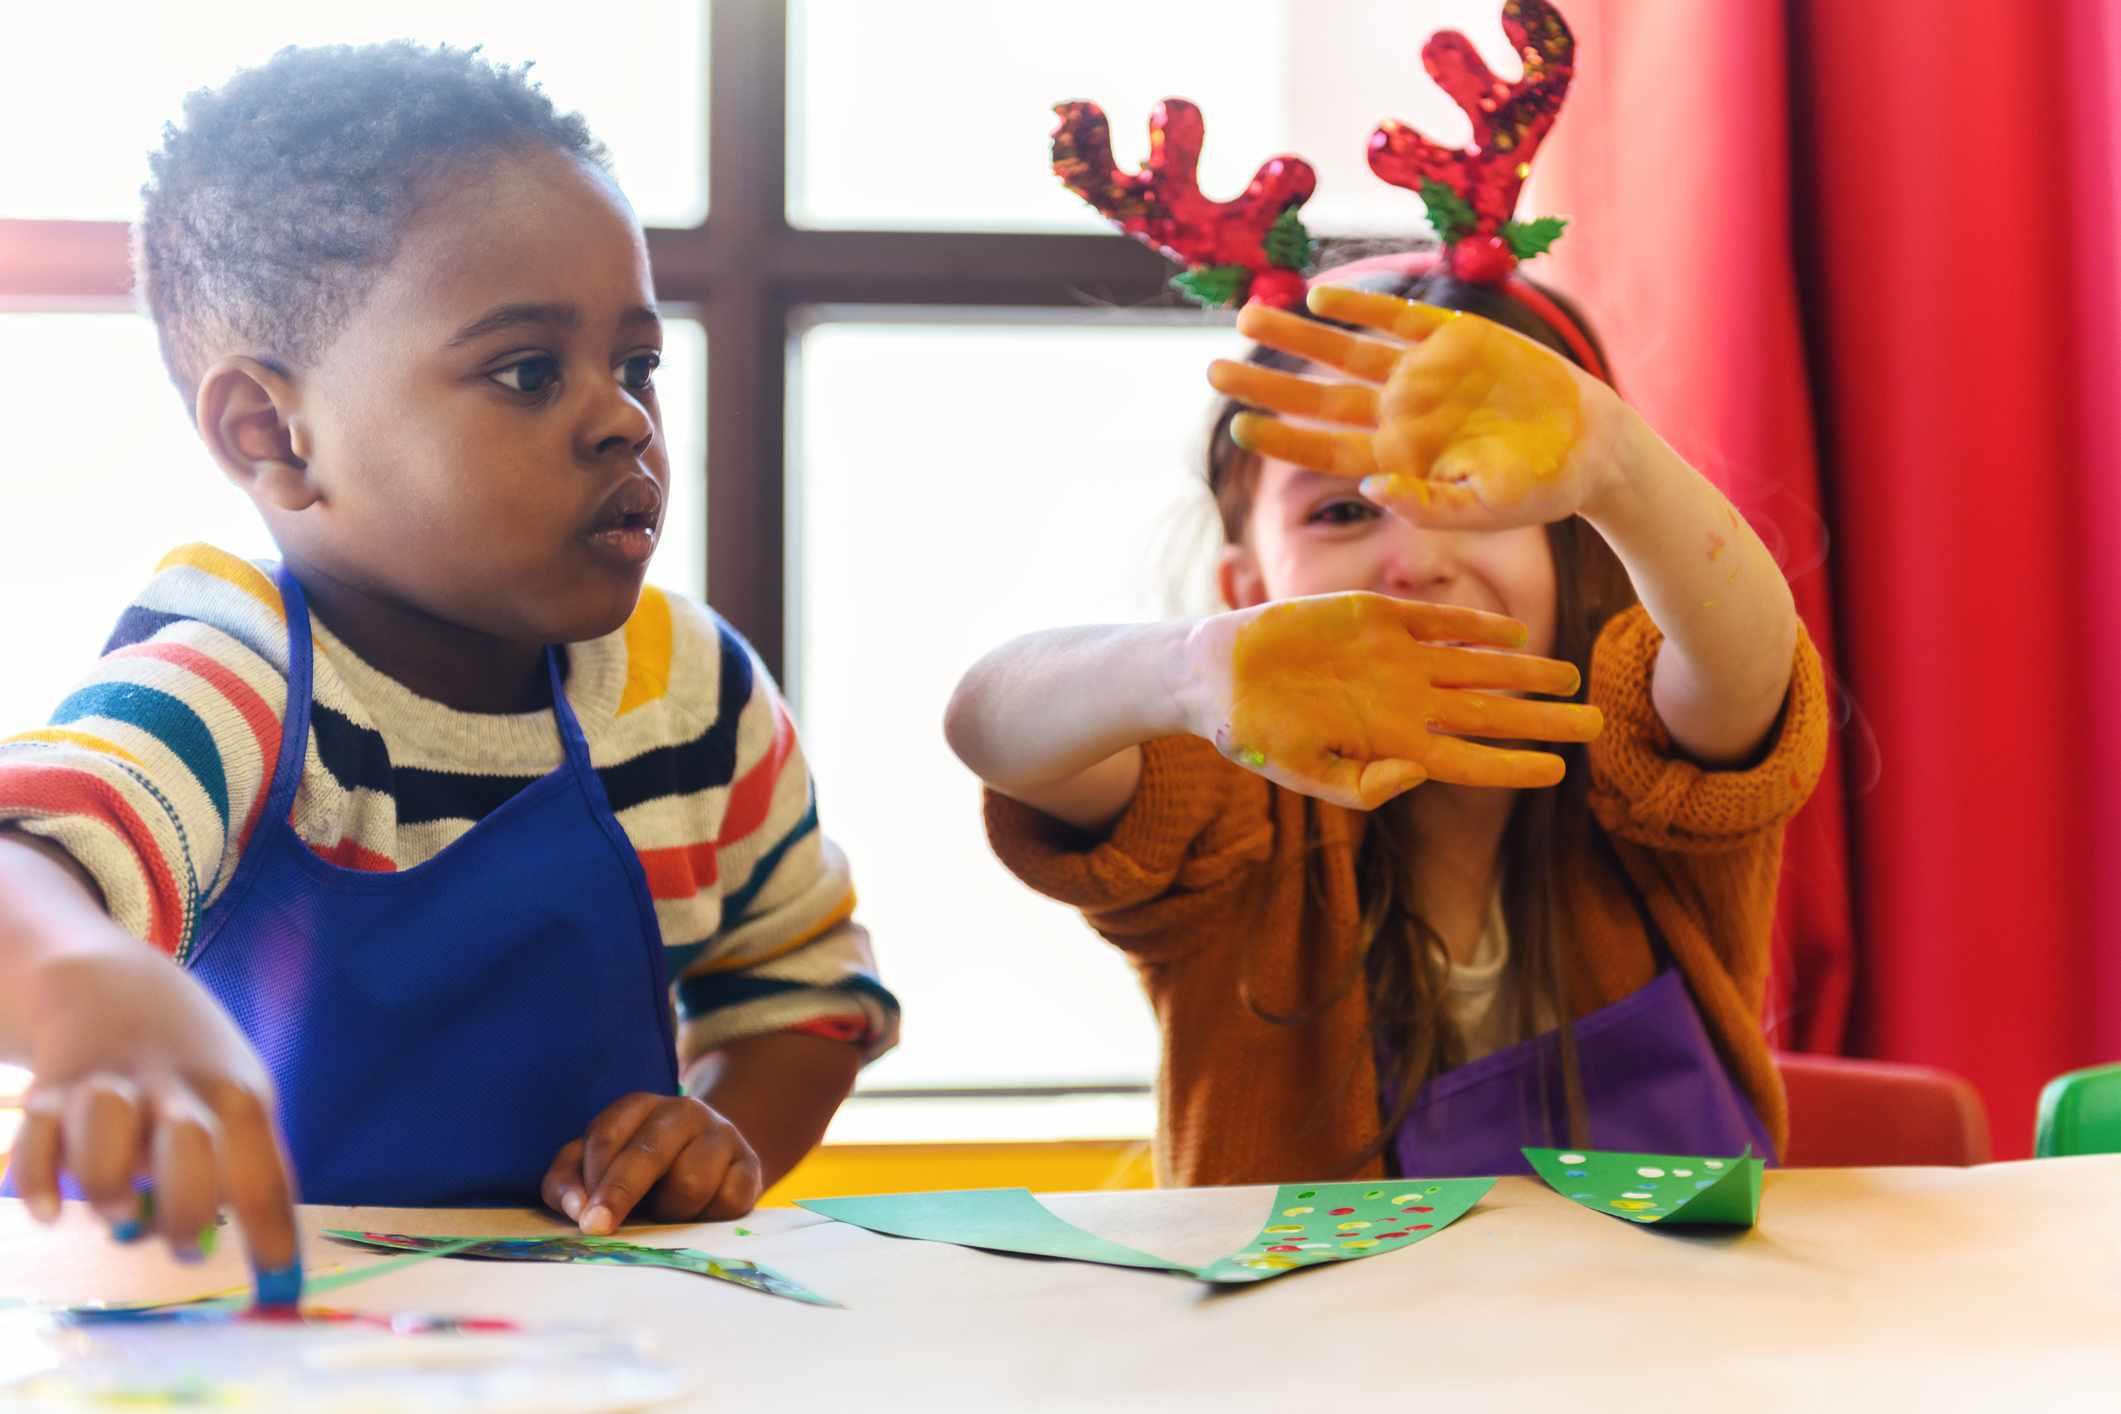 Preschoolers making Christmas crafts